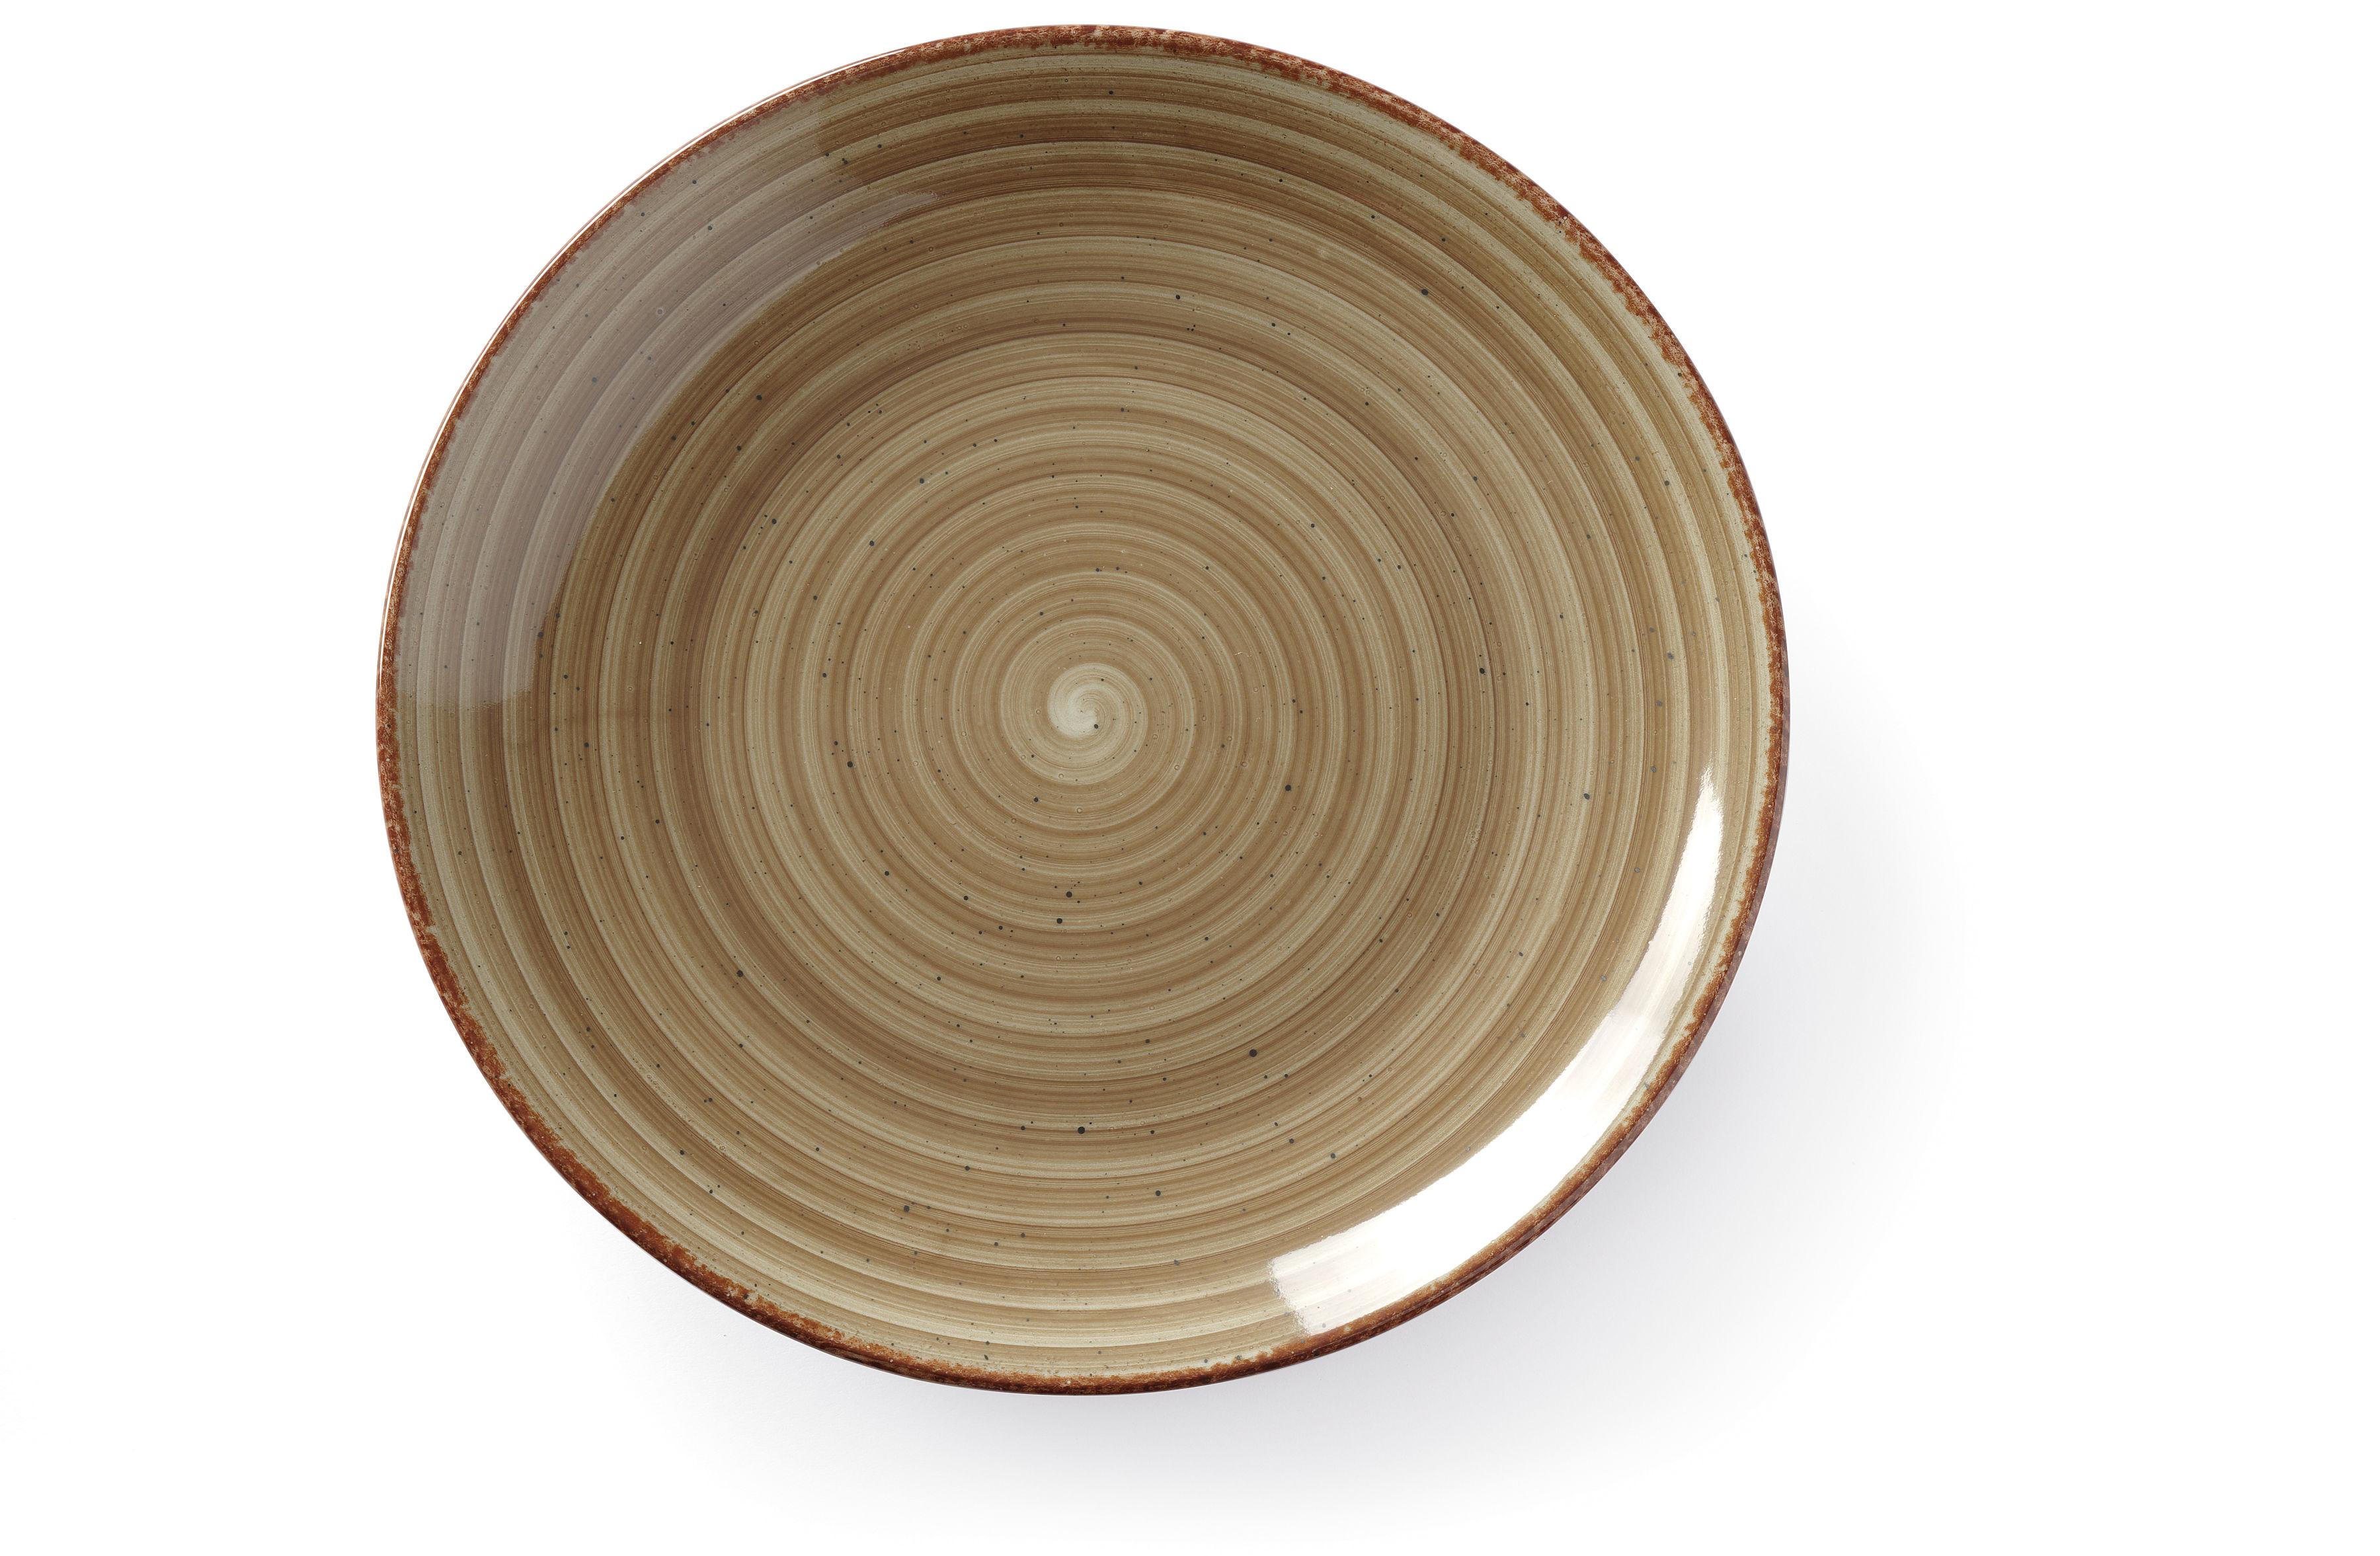 Talerz płytki Agat 270 mm porcelana Fine Dine 774557